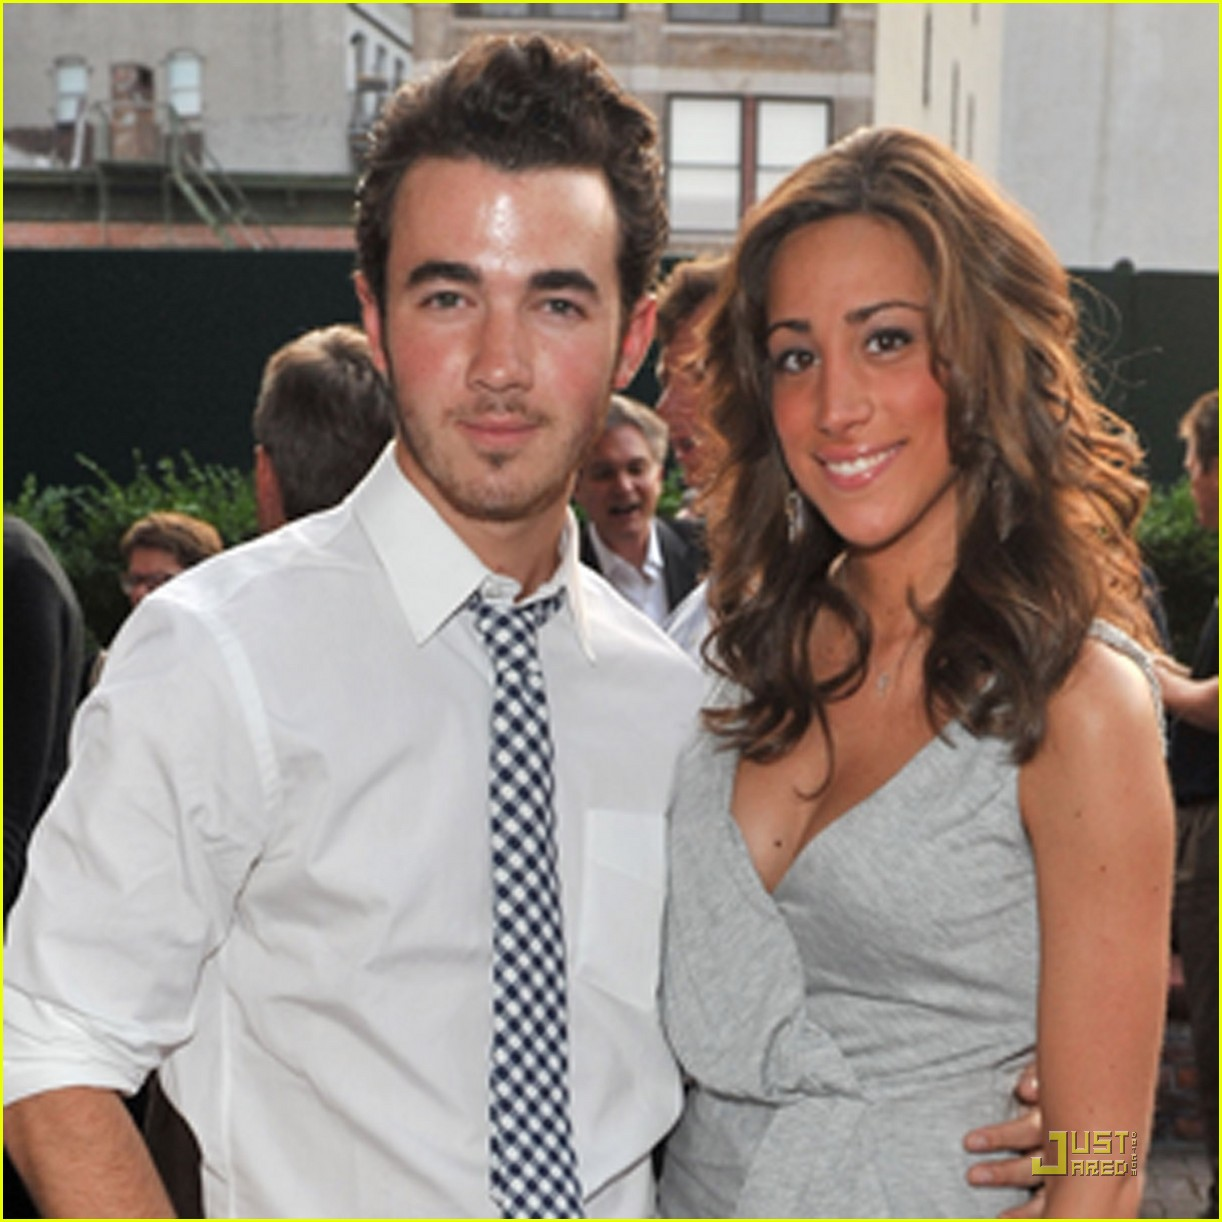 Kevin Jonas And Danielle